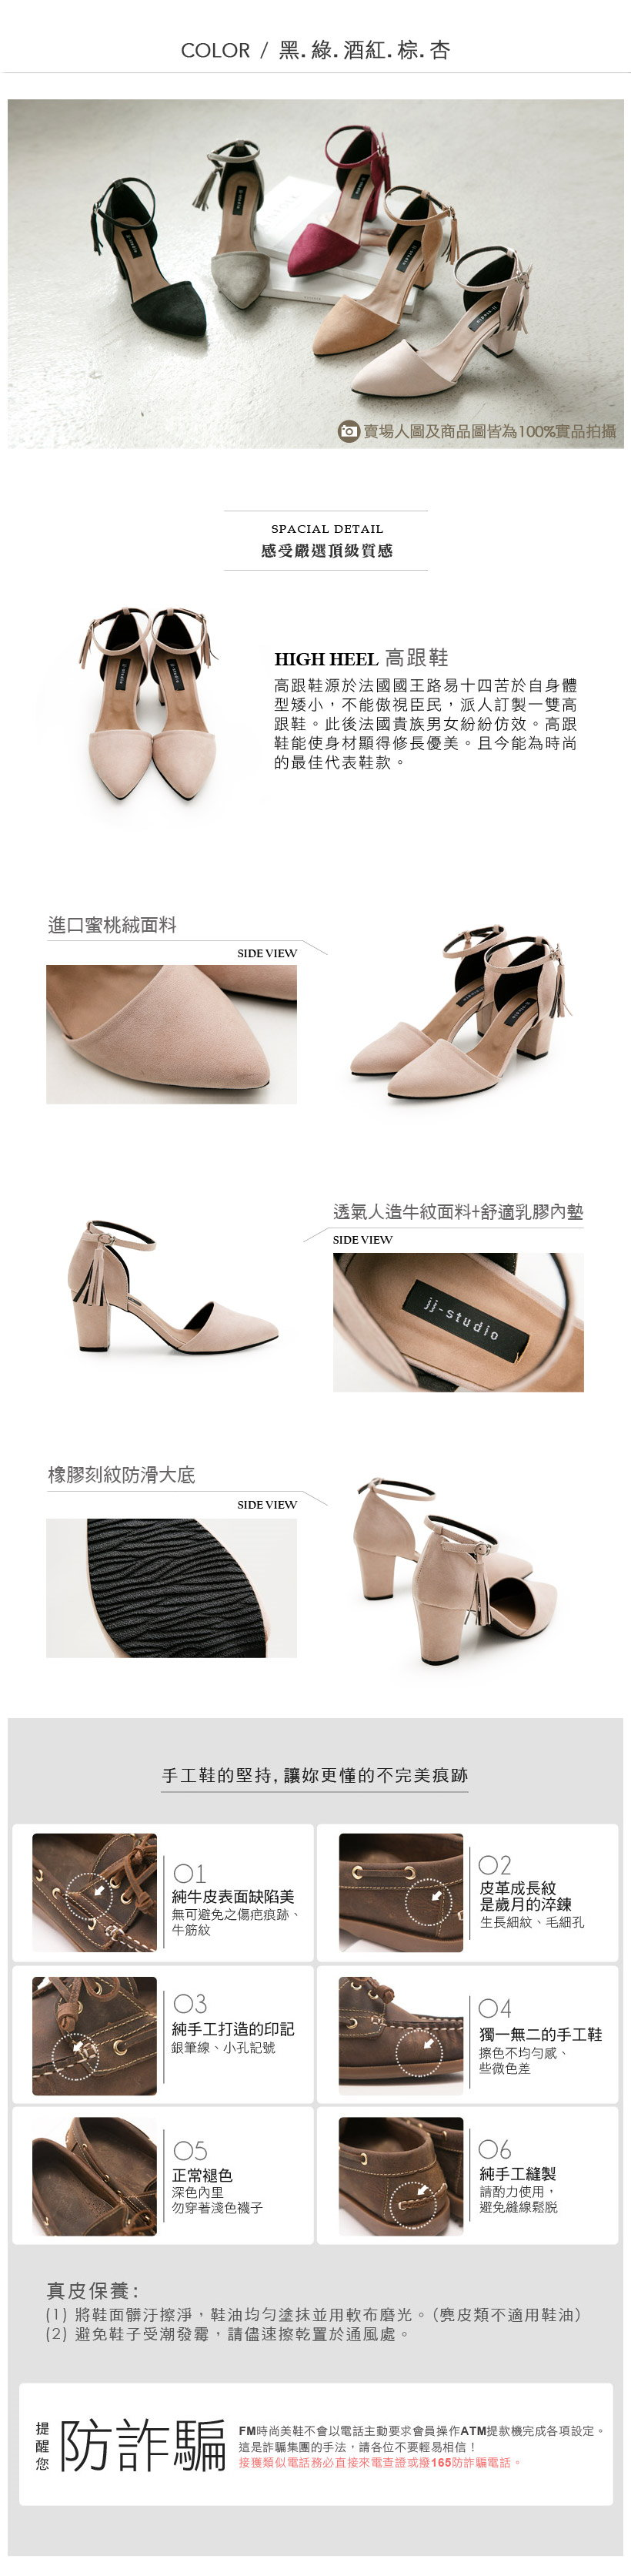 JJ-細絨流蘇踝釦尖頭高跟包鞋